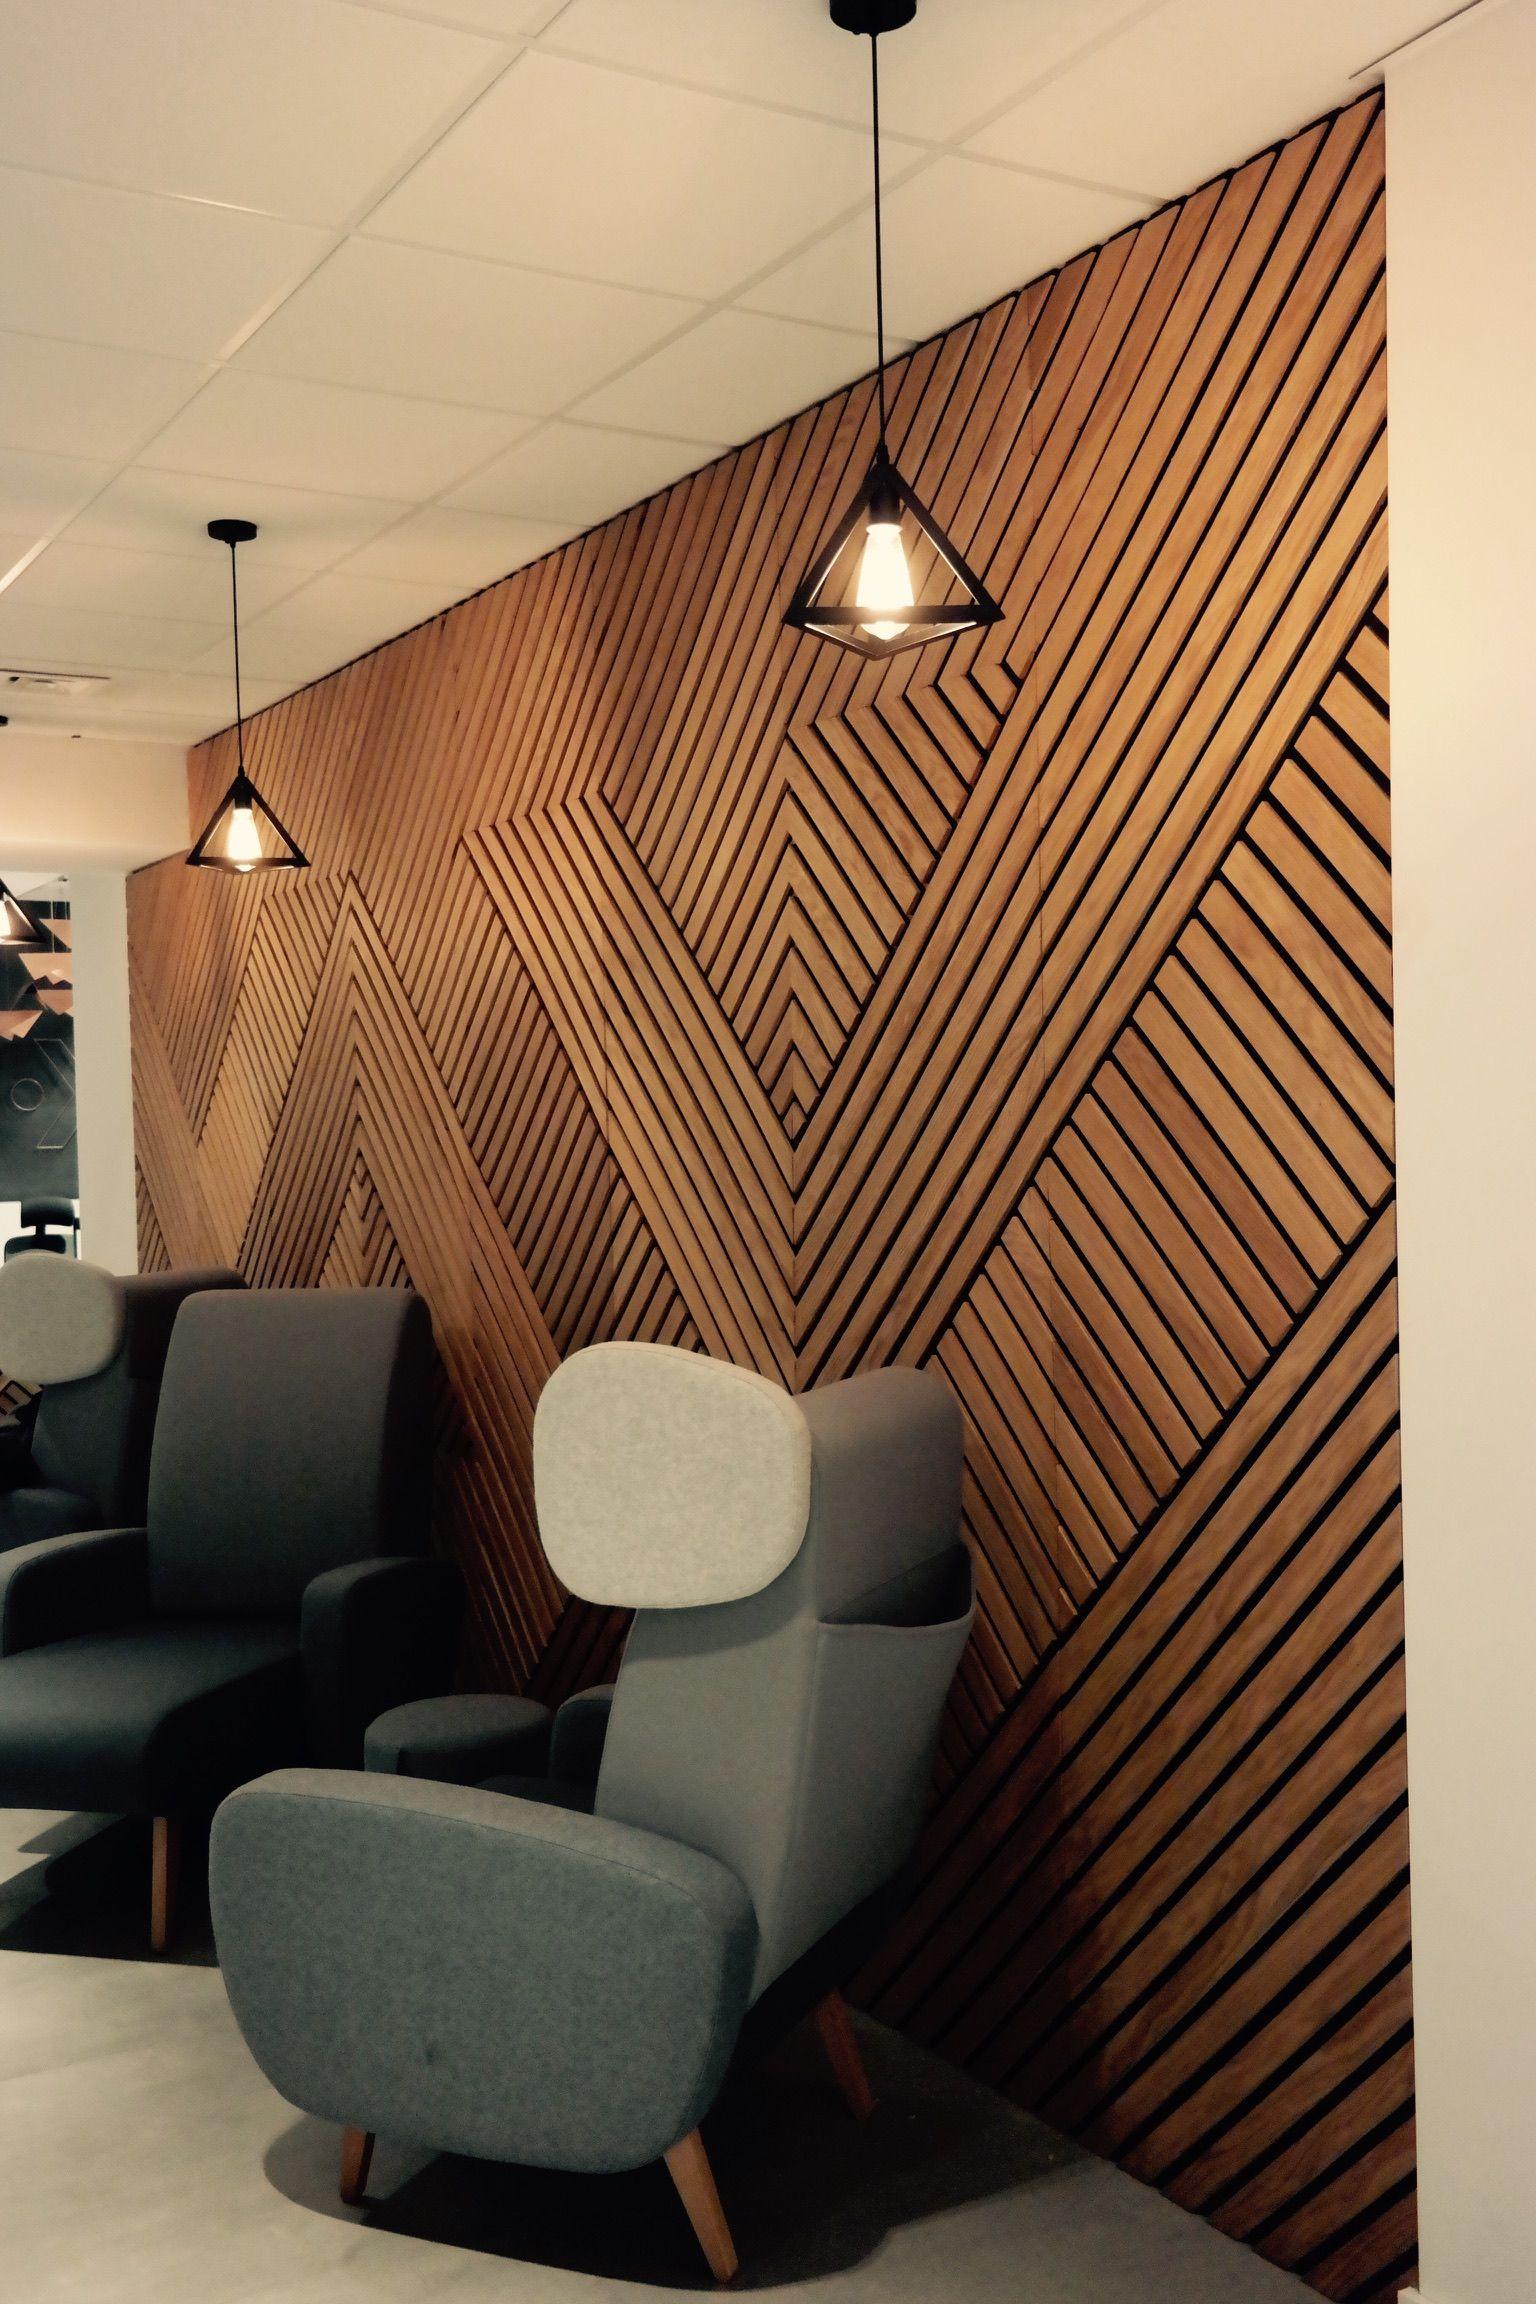 Living Room Wall Panel Design: Wall Panels, Comb Wall Panels, Wall Coveting, Wall Panels